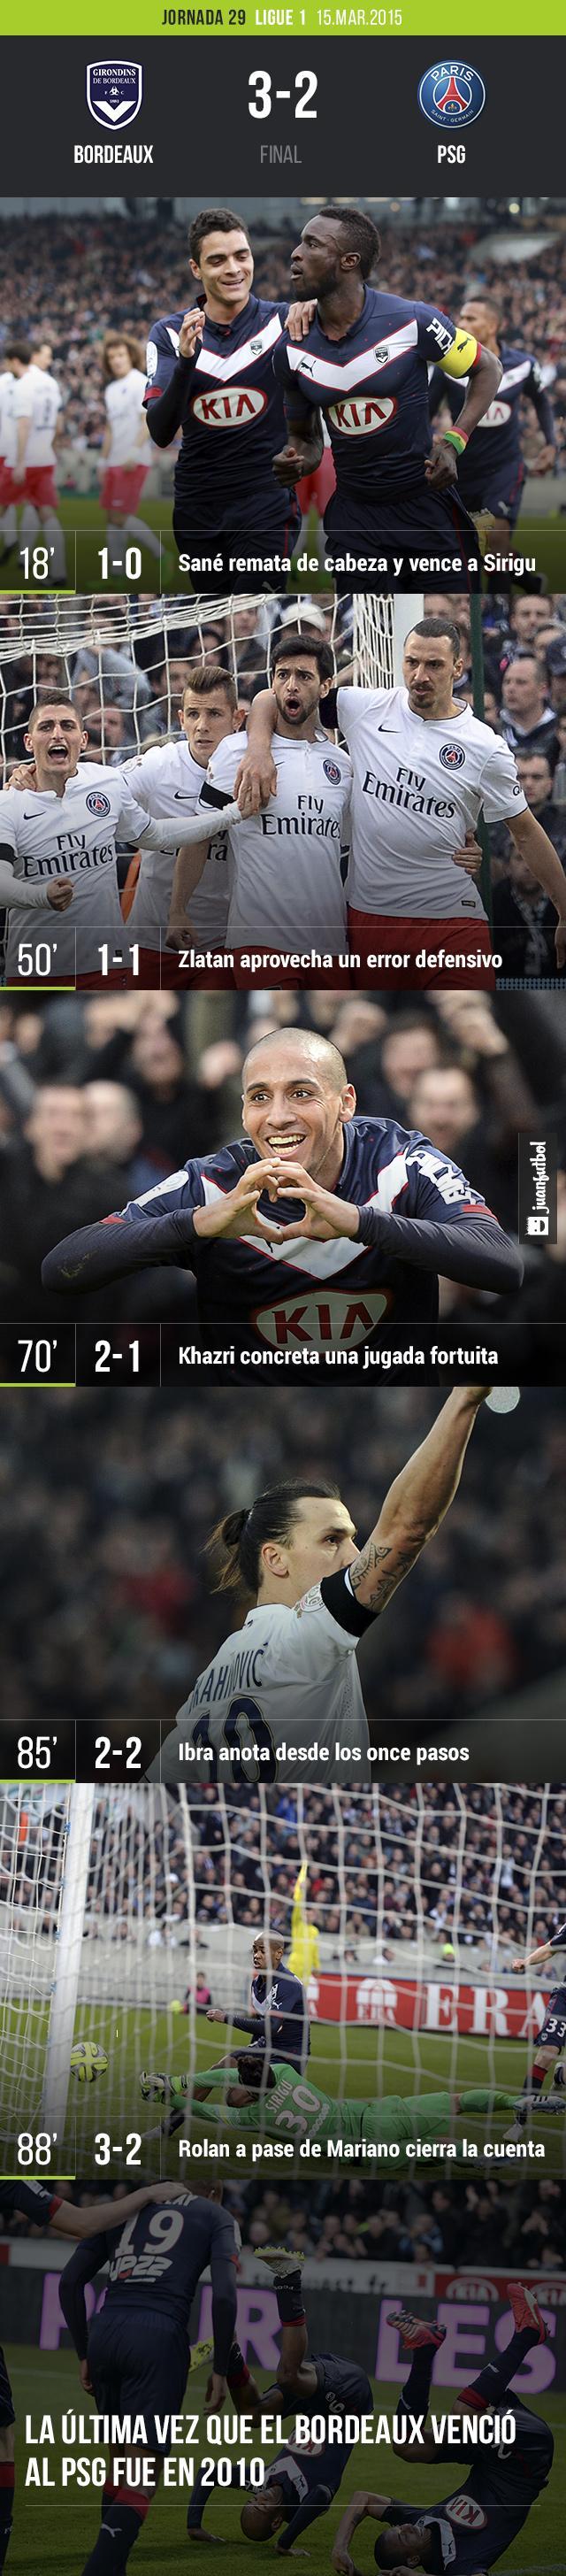 El Bordeaux vence 3-2 al PSG en la Ligue 1. Zlatan contribuyó con un doblete mientras por el Bordeaux anotó Sané, Rolan Khazri